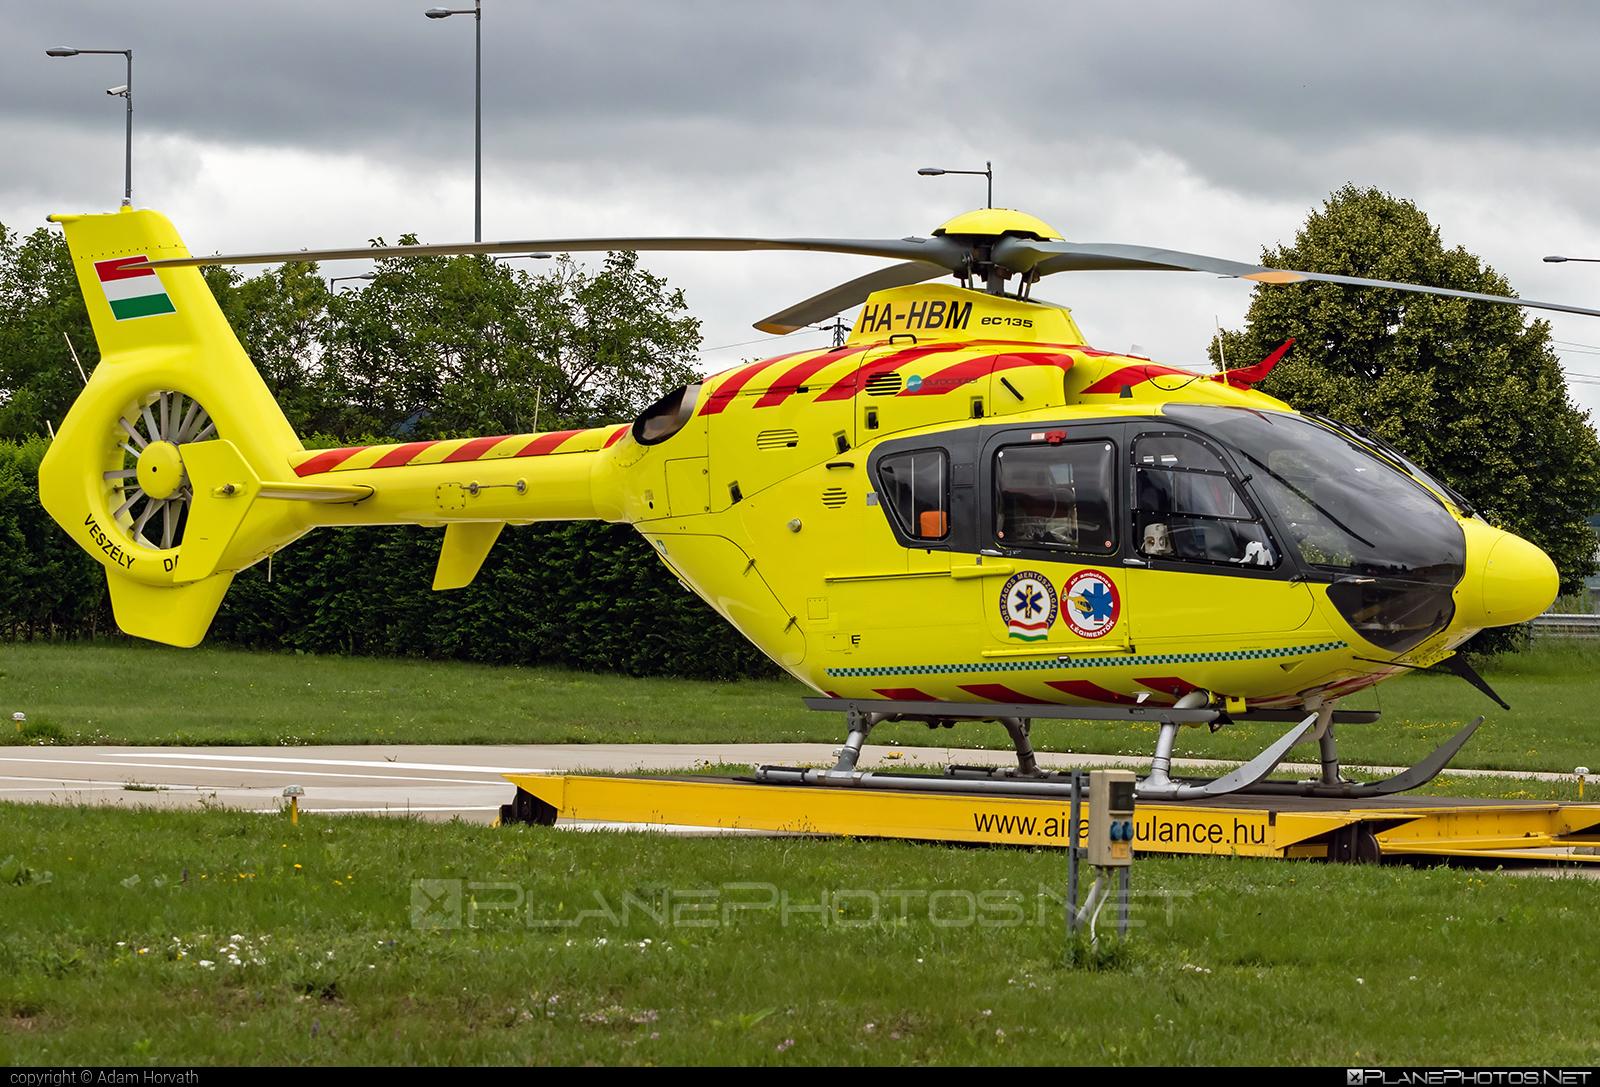 Eurocopter EC135 P2+ - HA-HBM operated by Magyar Légimentő Nonprofit (Hungarian Air Ambulance) #ec135 #ec135p2 #ec135p2plus #eurocopter #hungarianairambulance #magyarlegimentononprofit